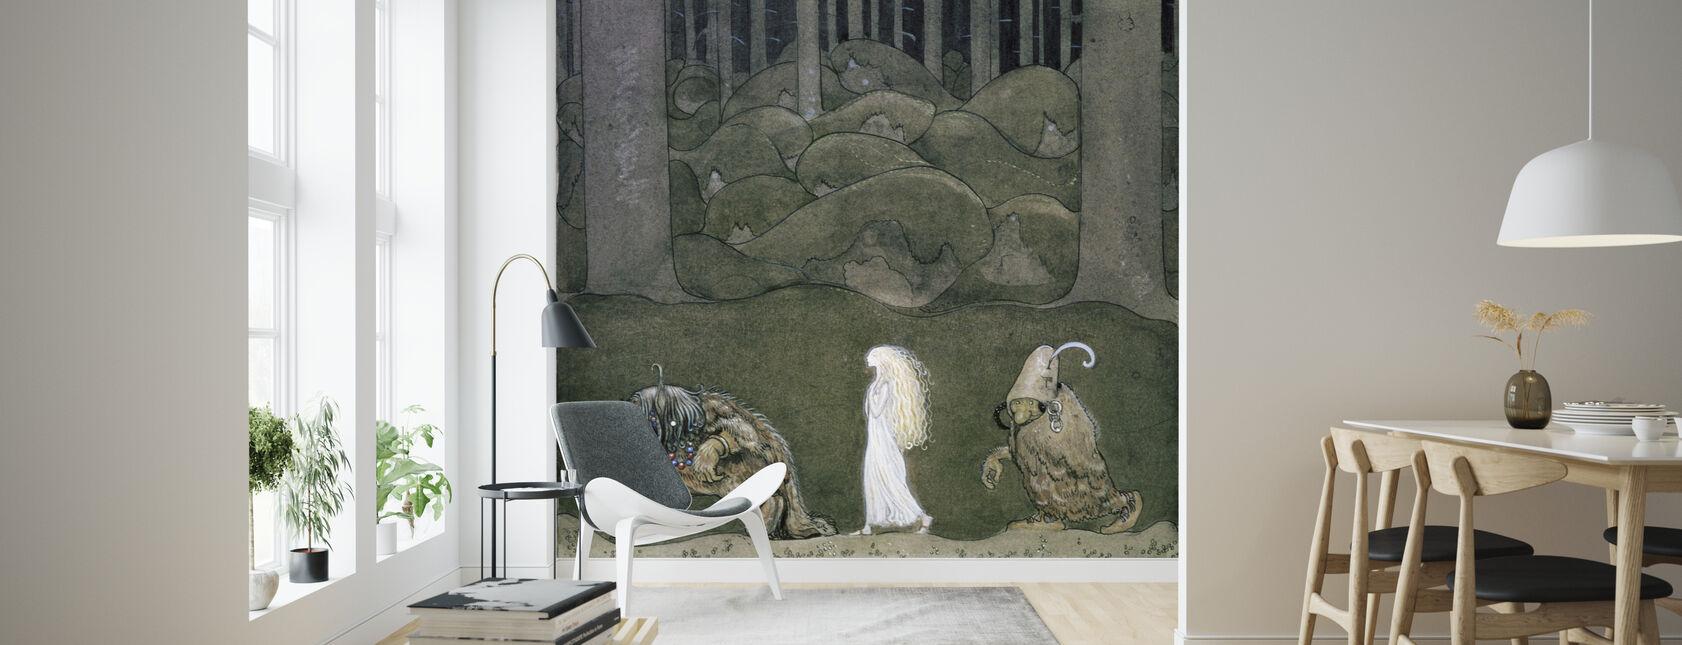 Princess and the Trolls - John Bauer - Wallpaper - Living Room